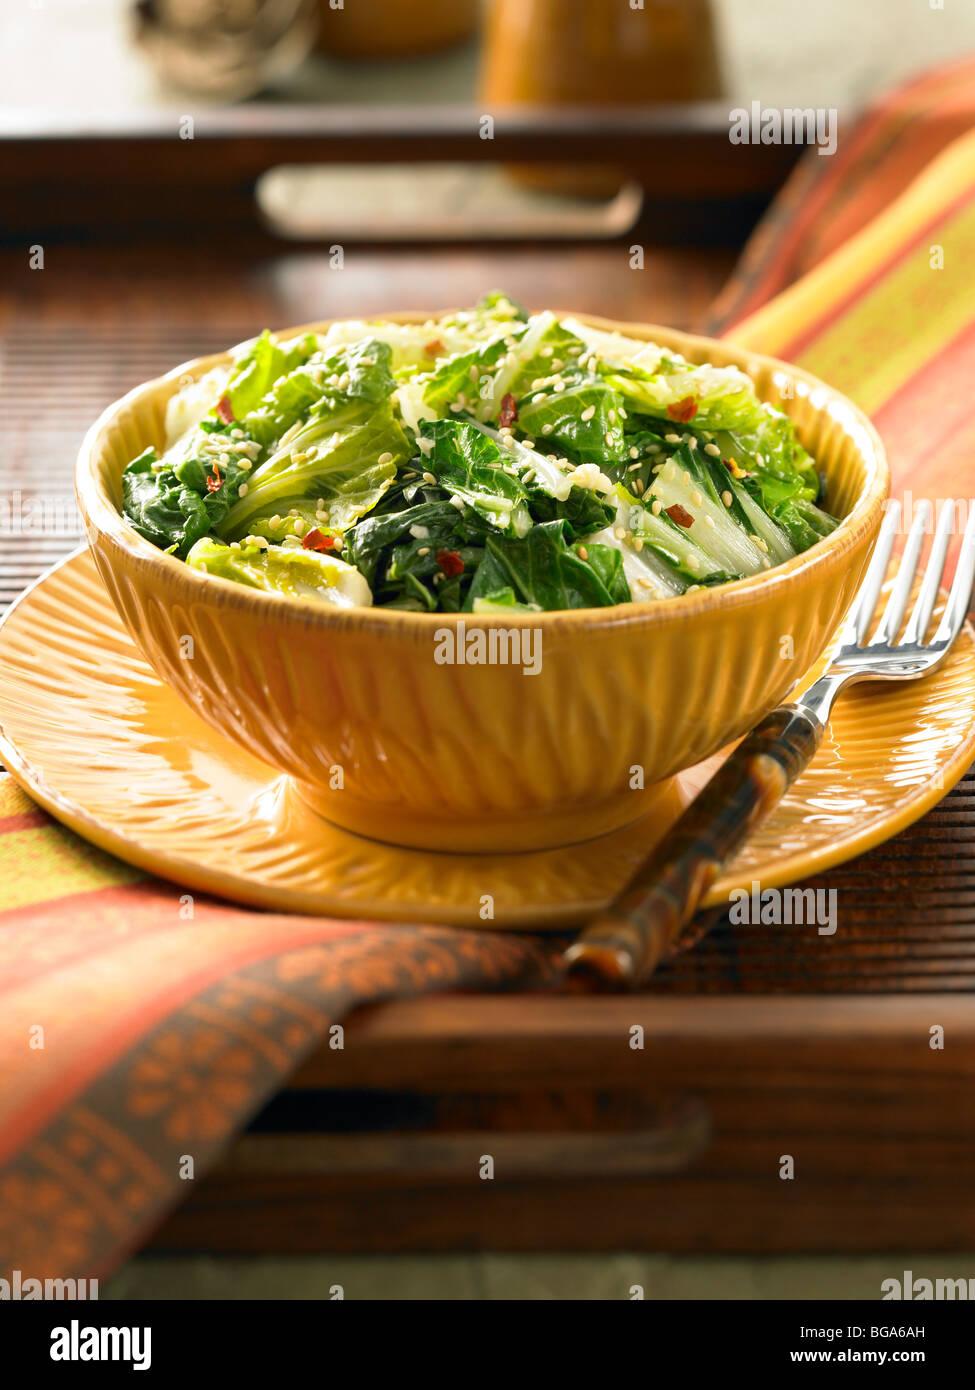 Sesame garlic bok choy salad - Stock Image